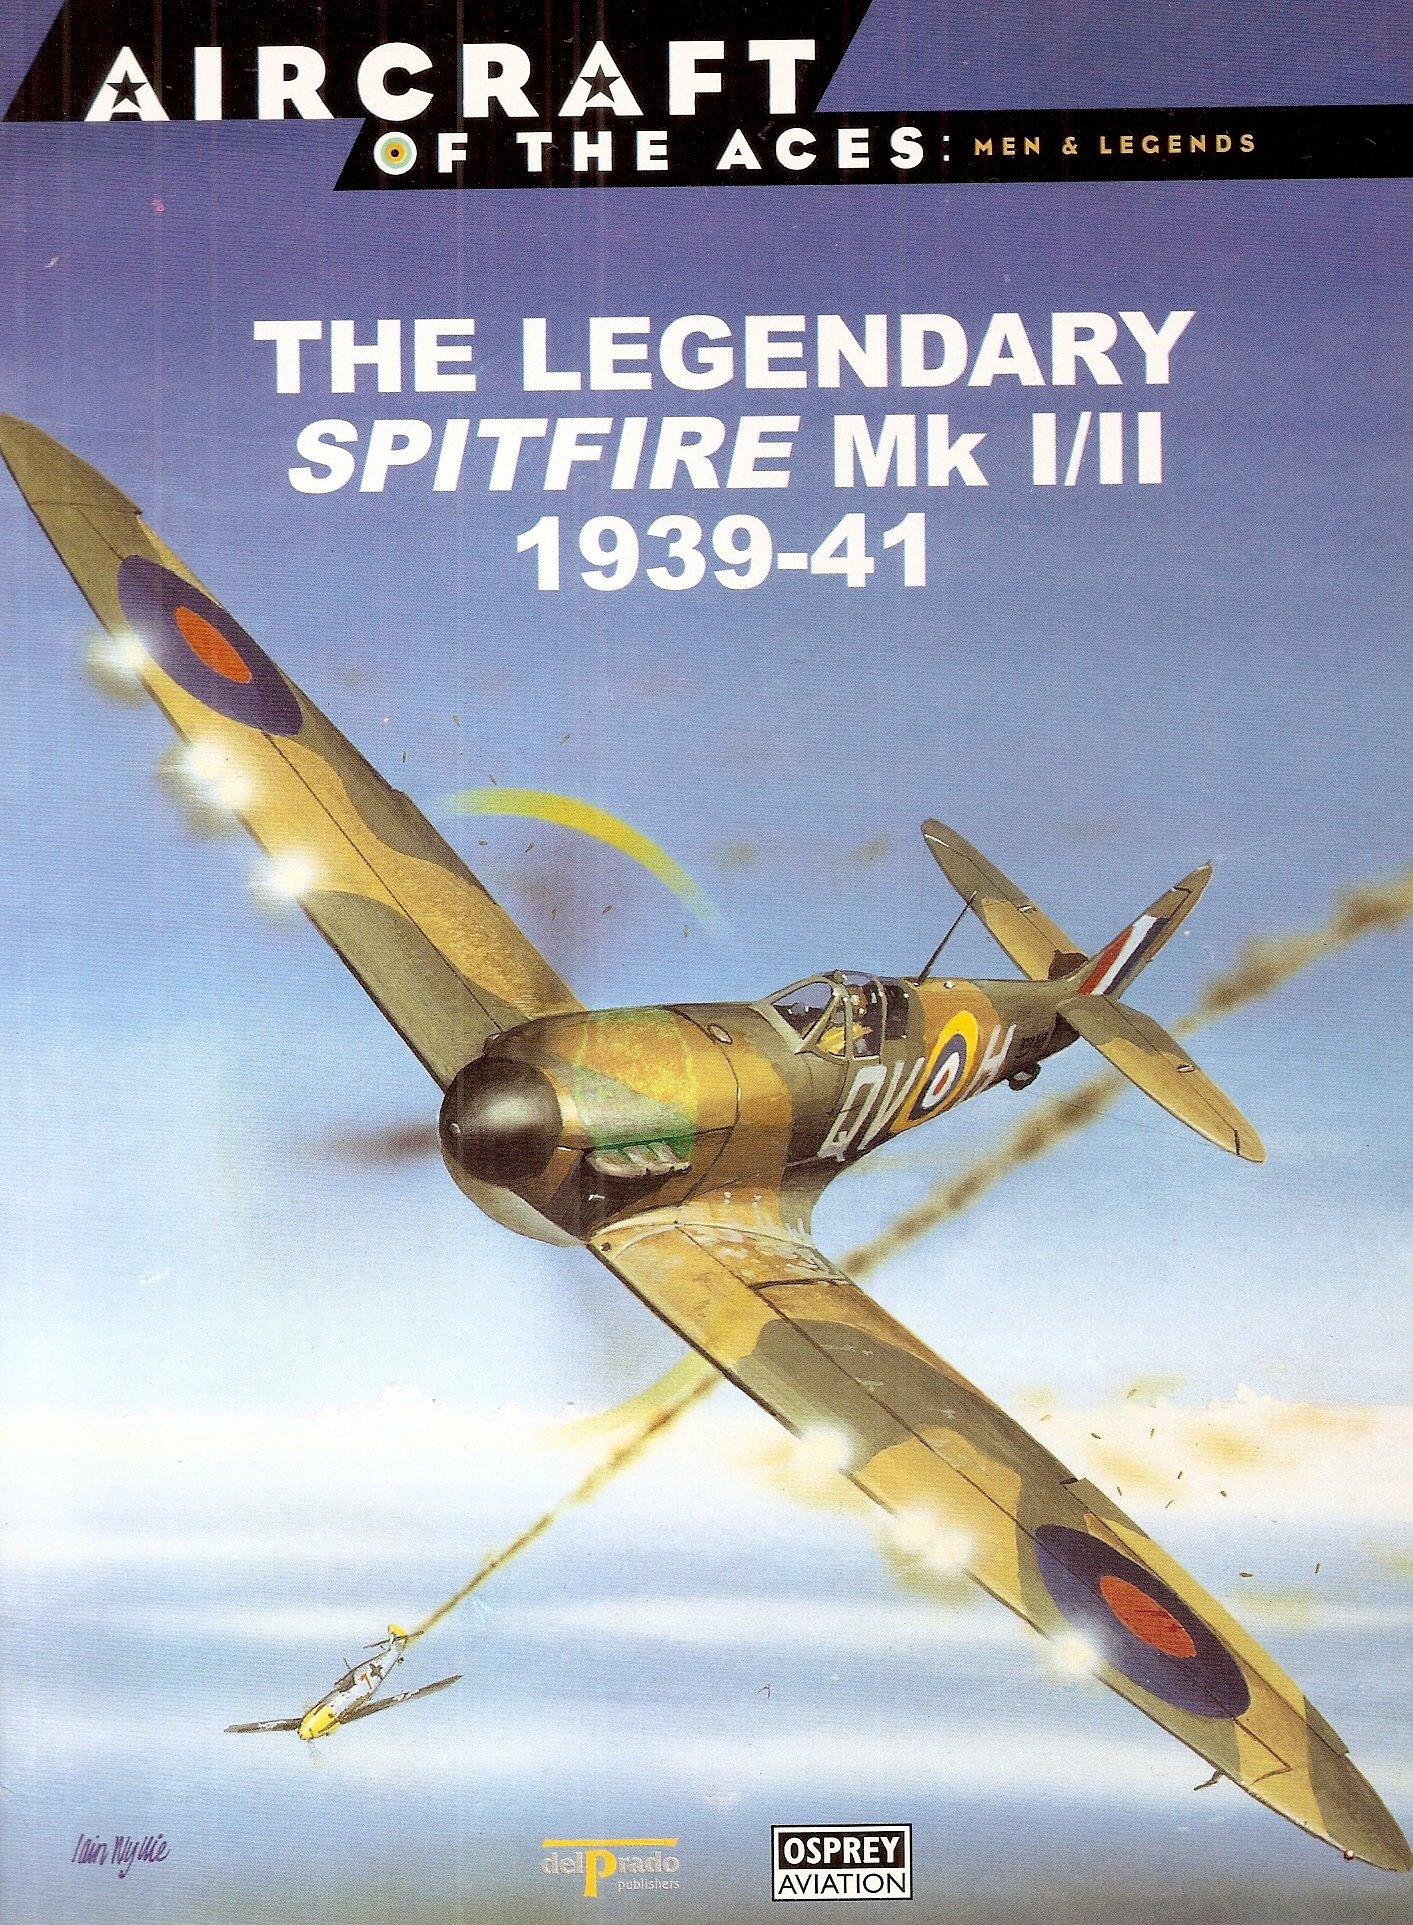 The Legendary Spitfire Mk I/II 1939-41